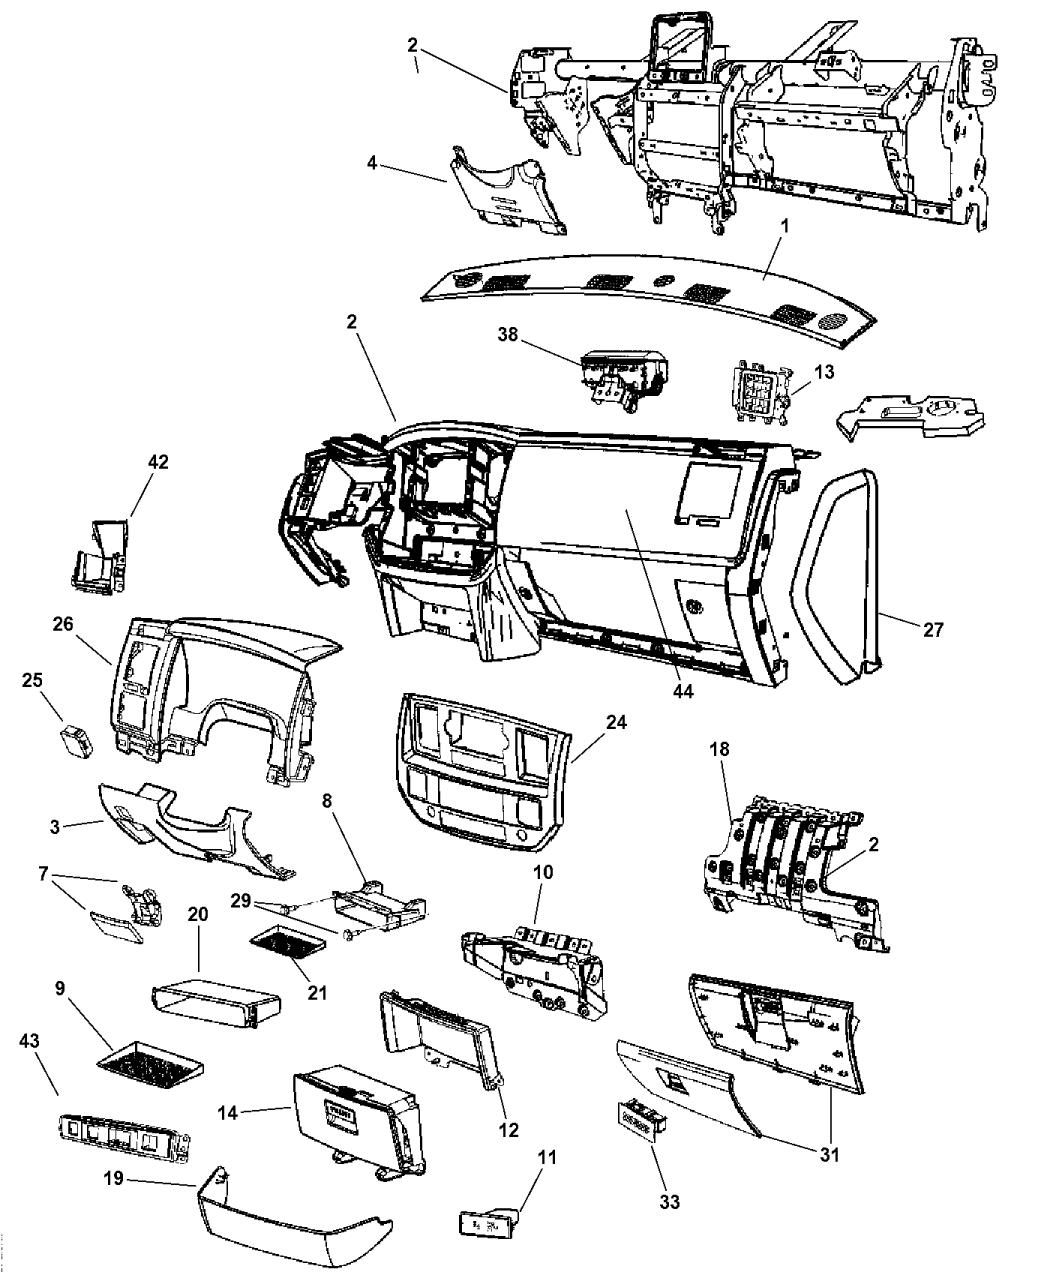 zk29xdhac